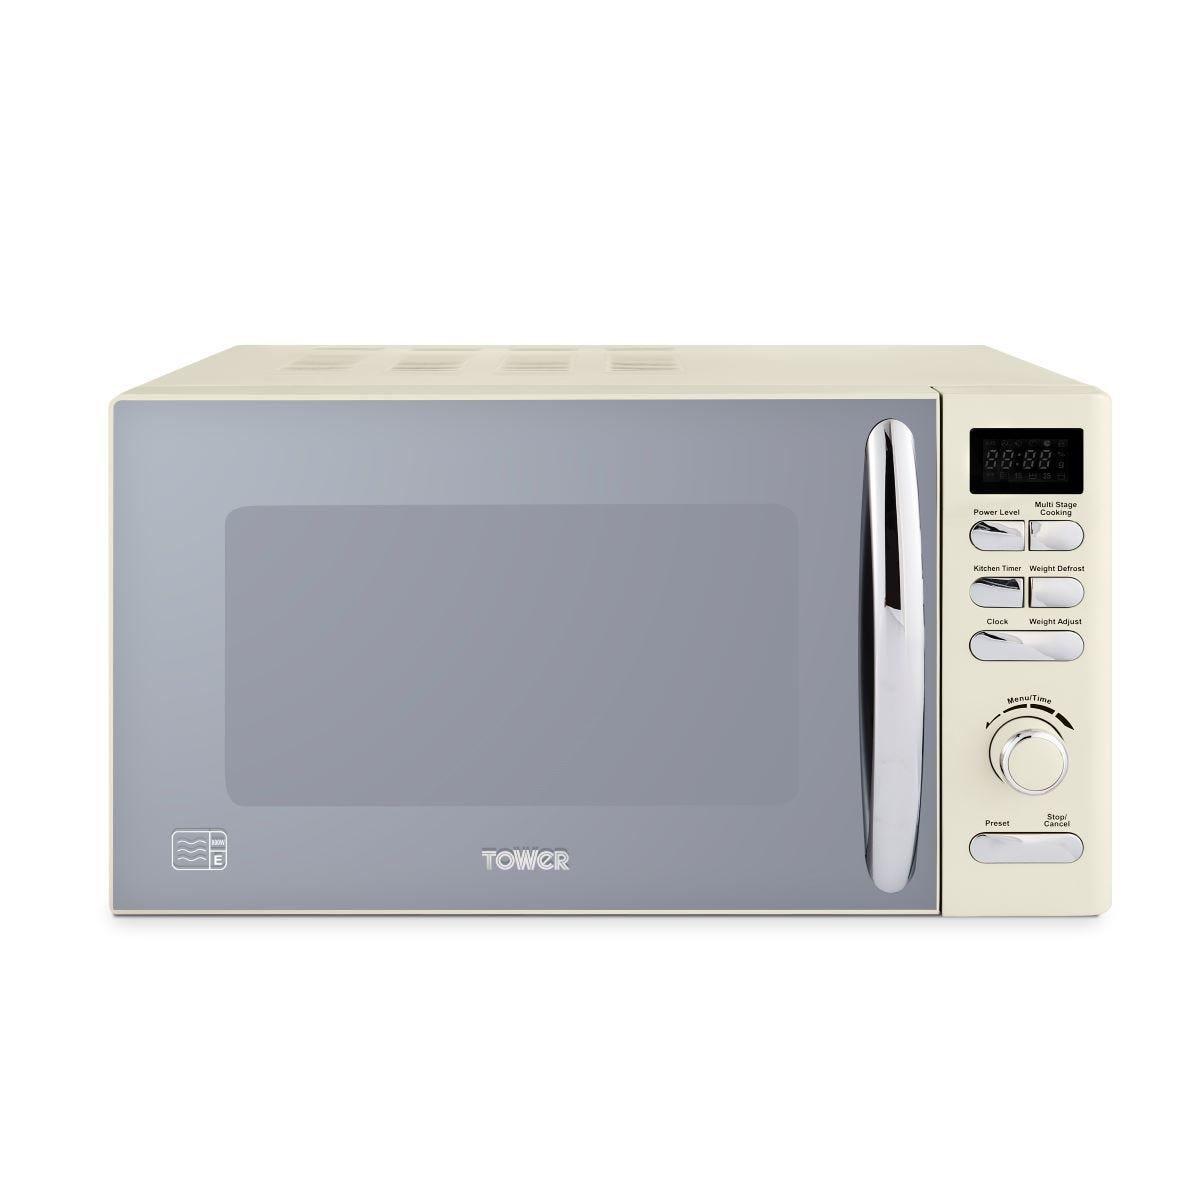 Tower T24032PEB Infinity Stone 800W 20L Digital Microwave - Cream